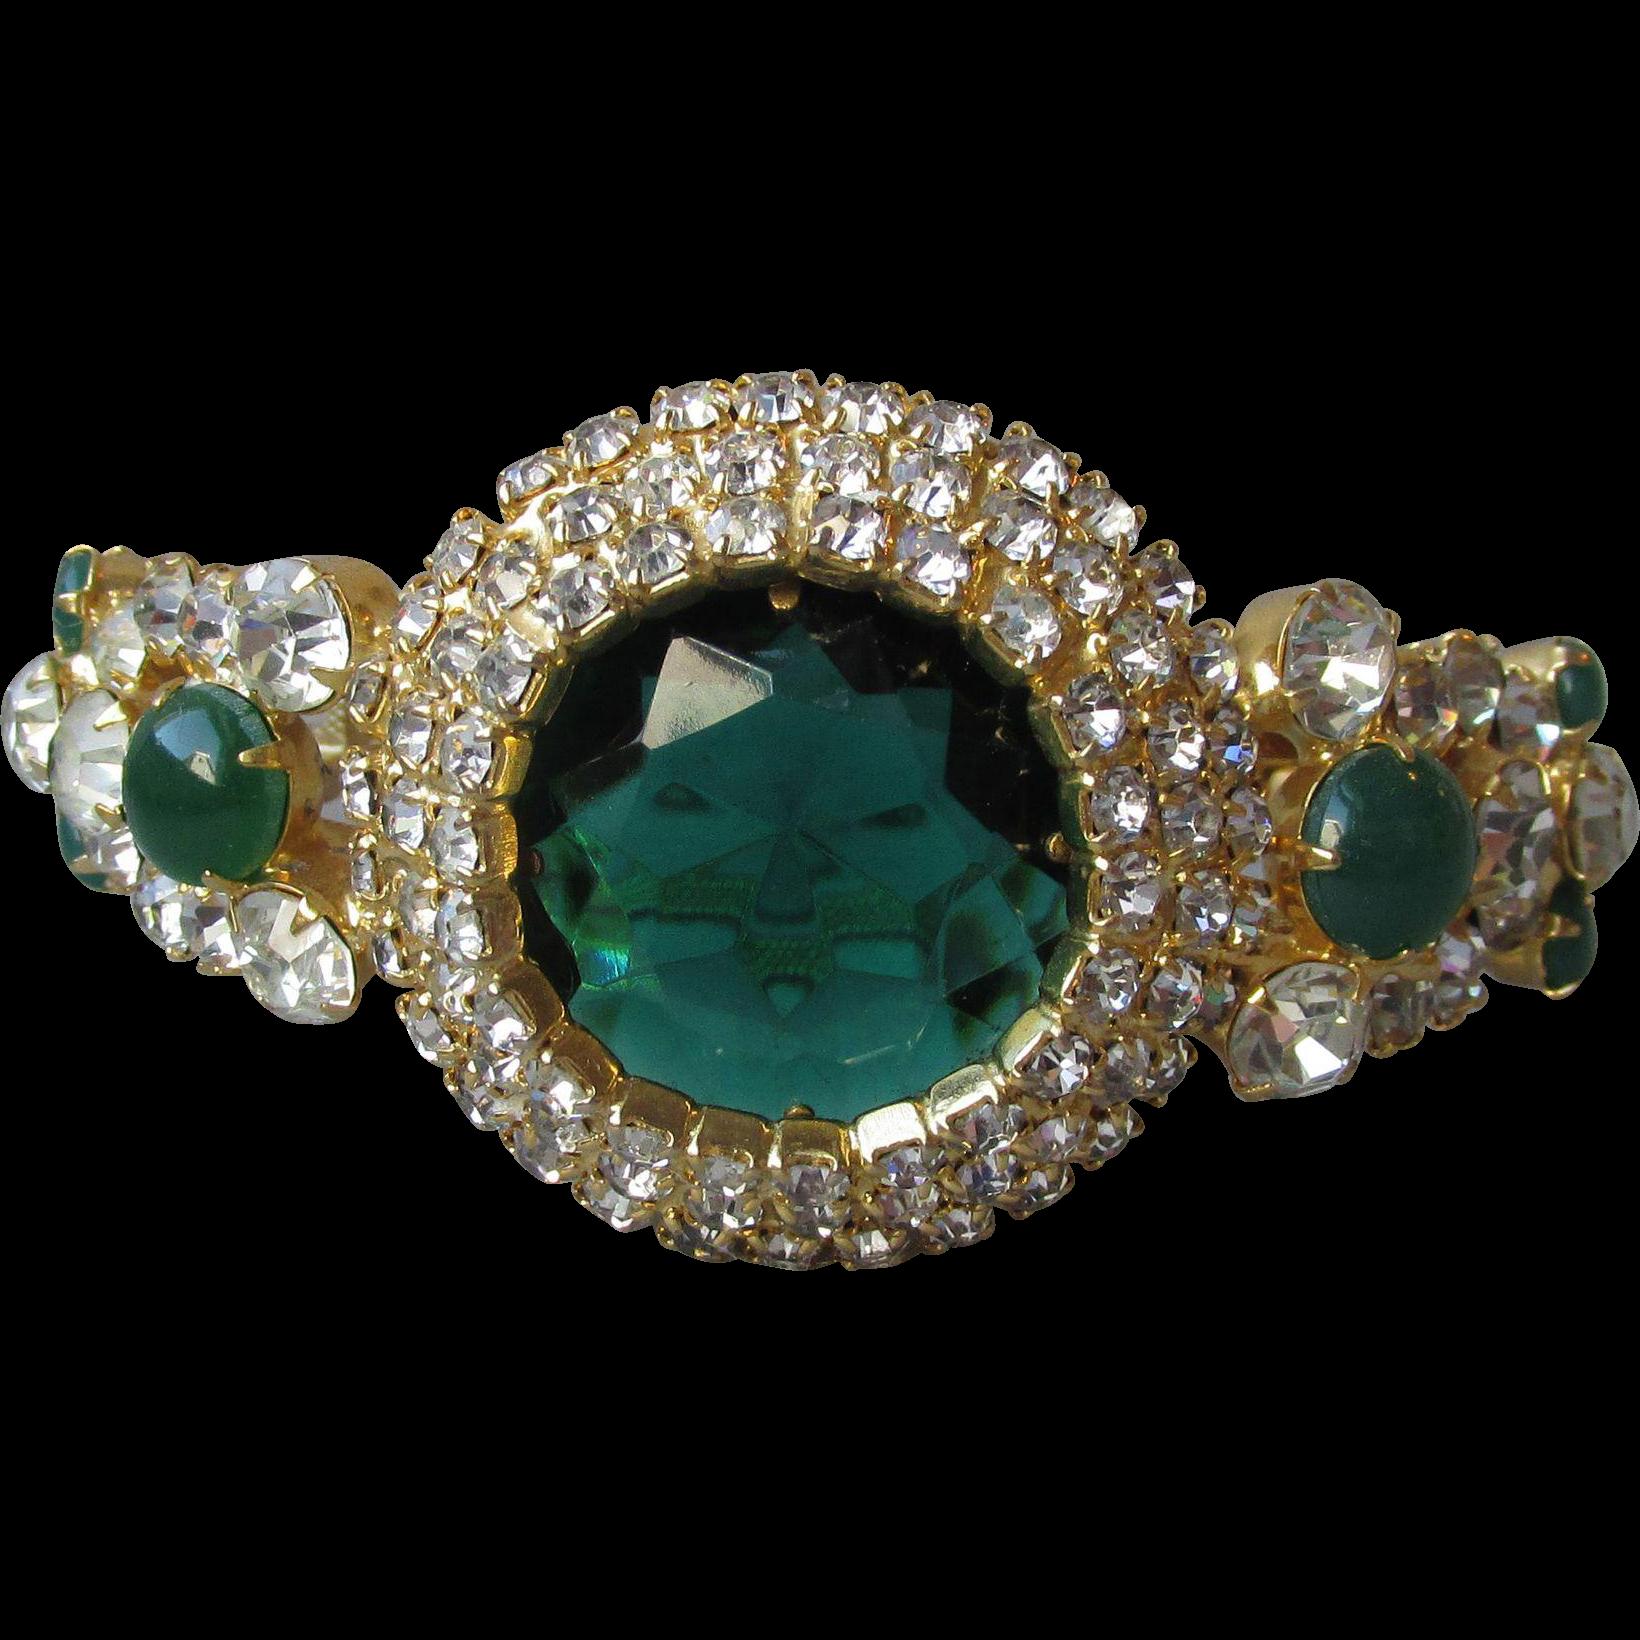 Magnificent Juliana DeLizza & Elster Emerald Green Rhinestone Clamper Bracelet